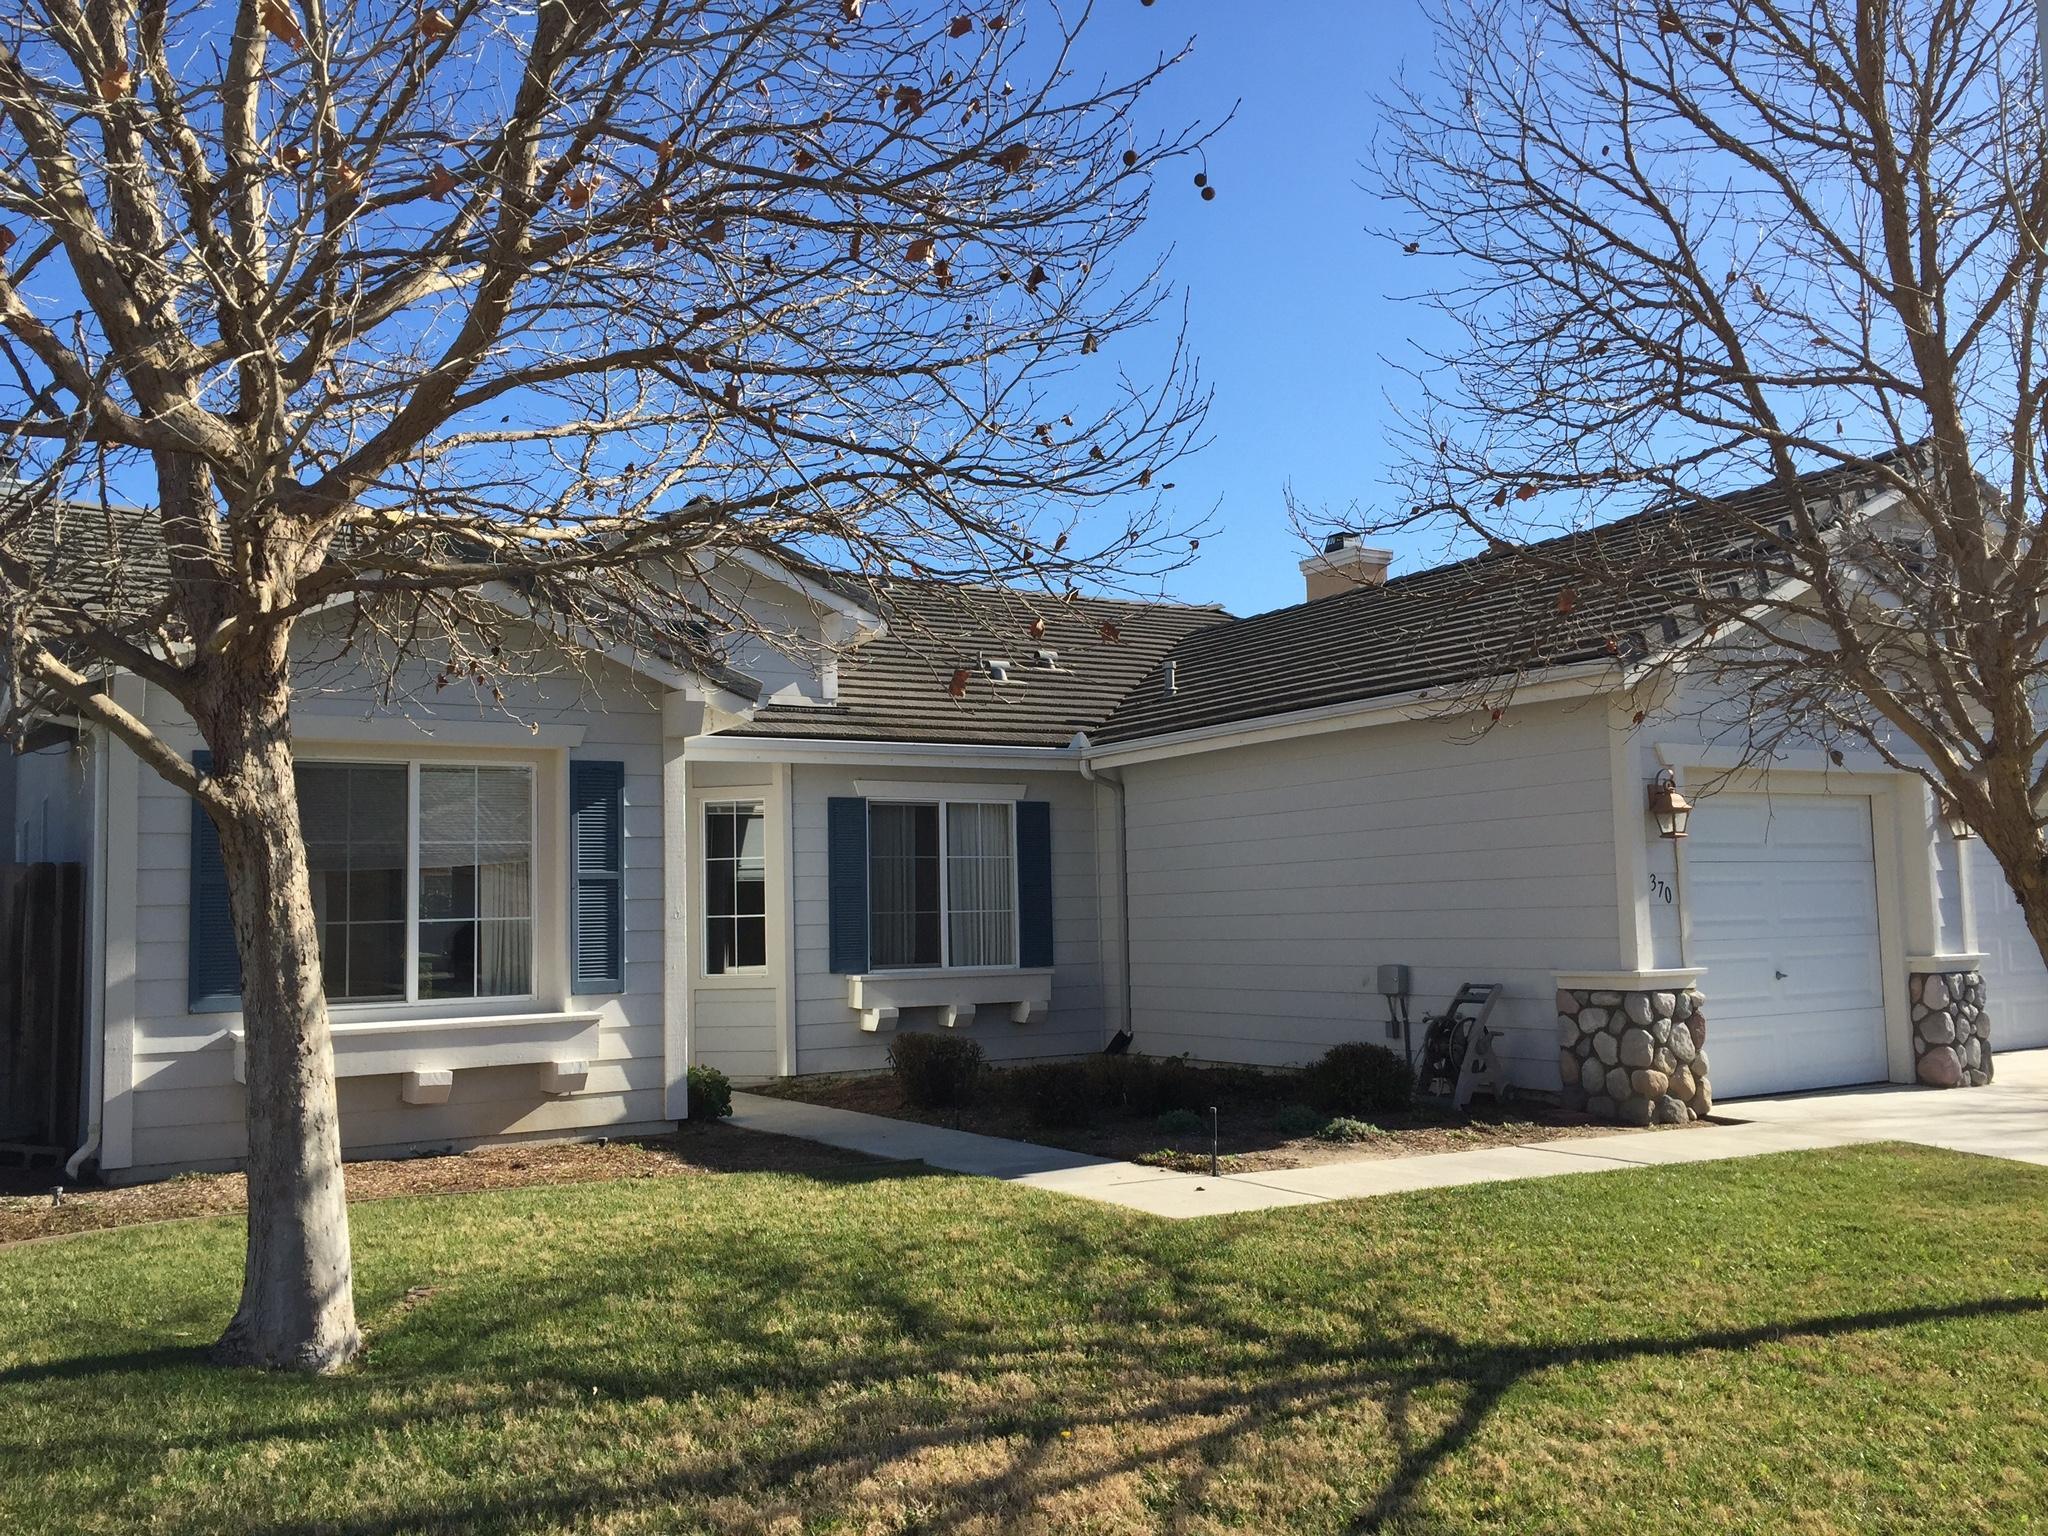 Property photo for 370 Beech Court Buellton, California 93427 - 15-245